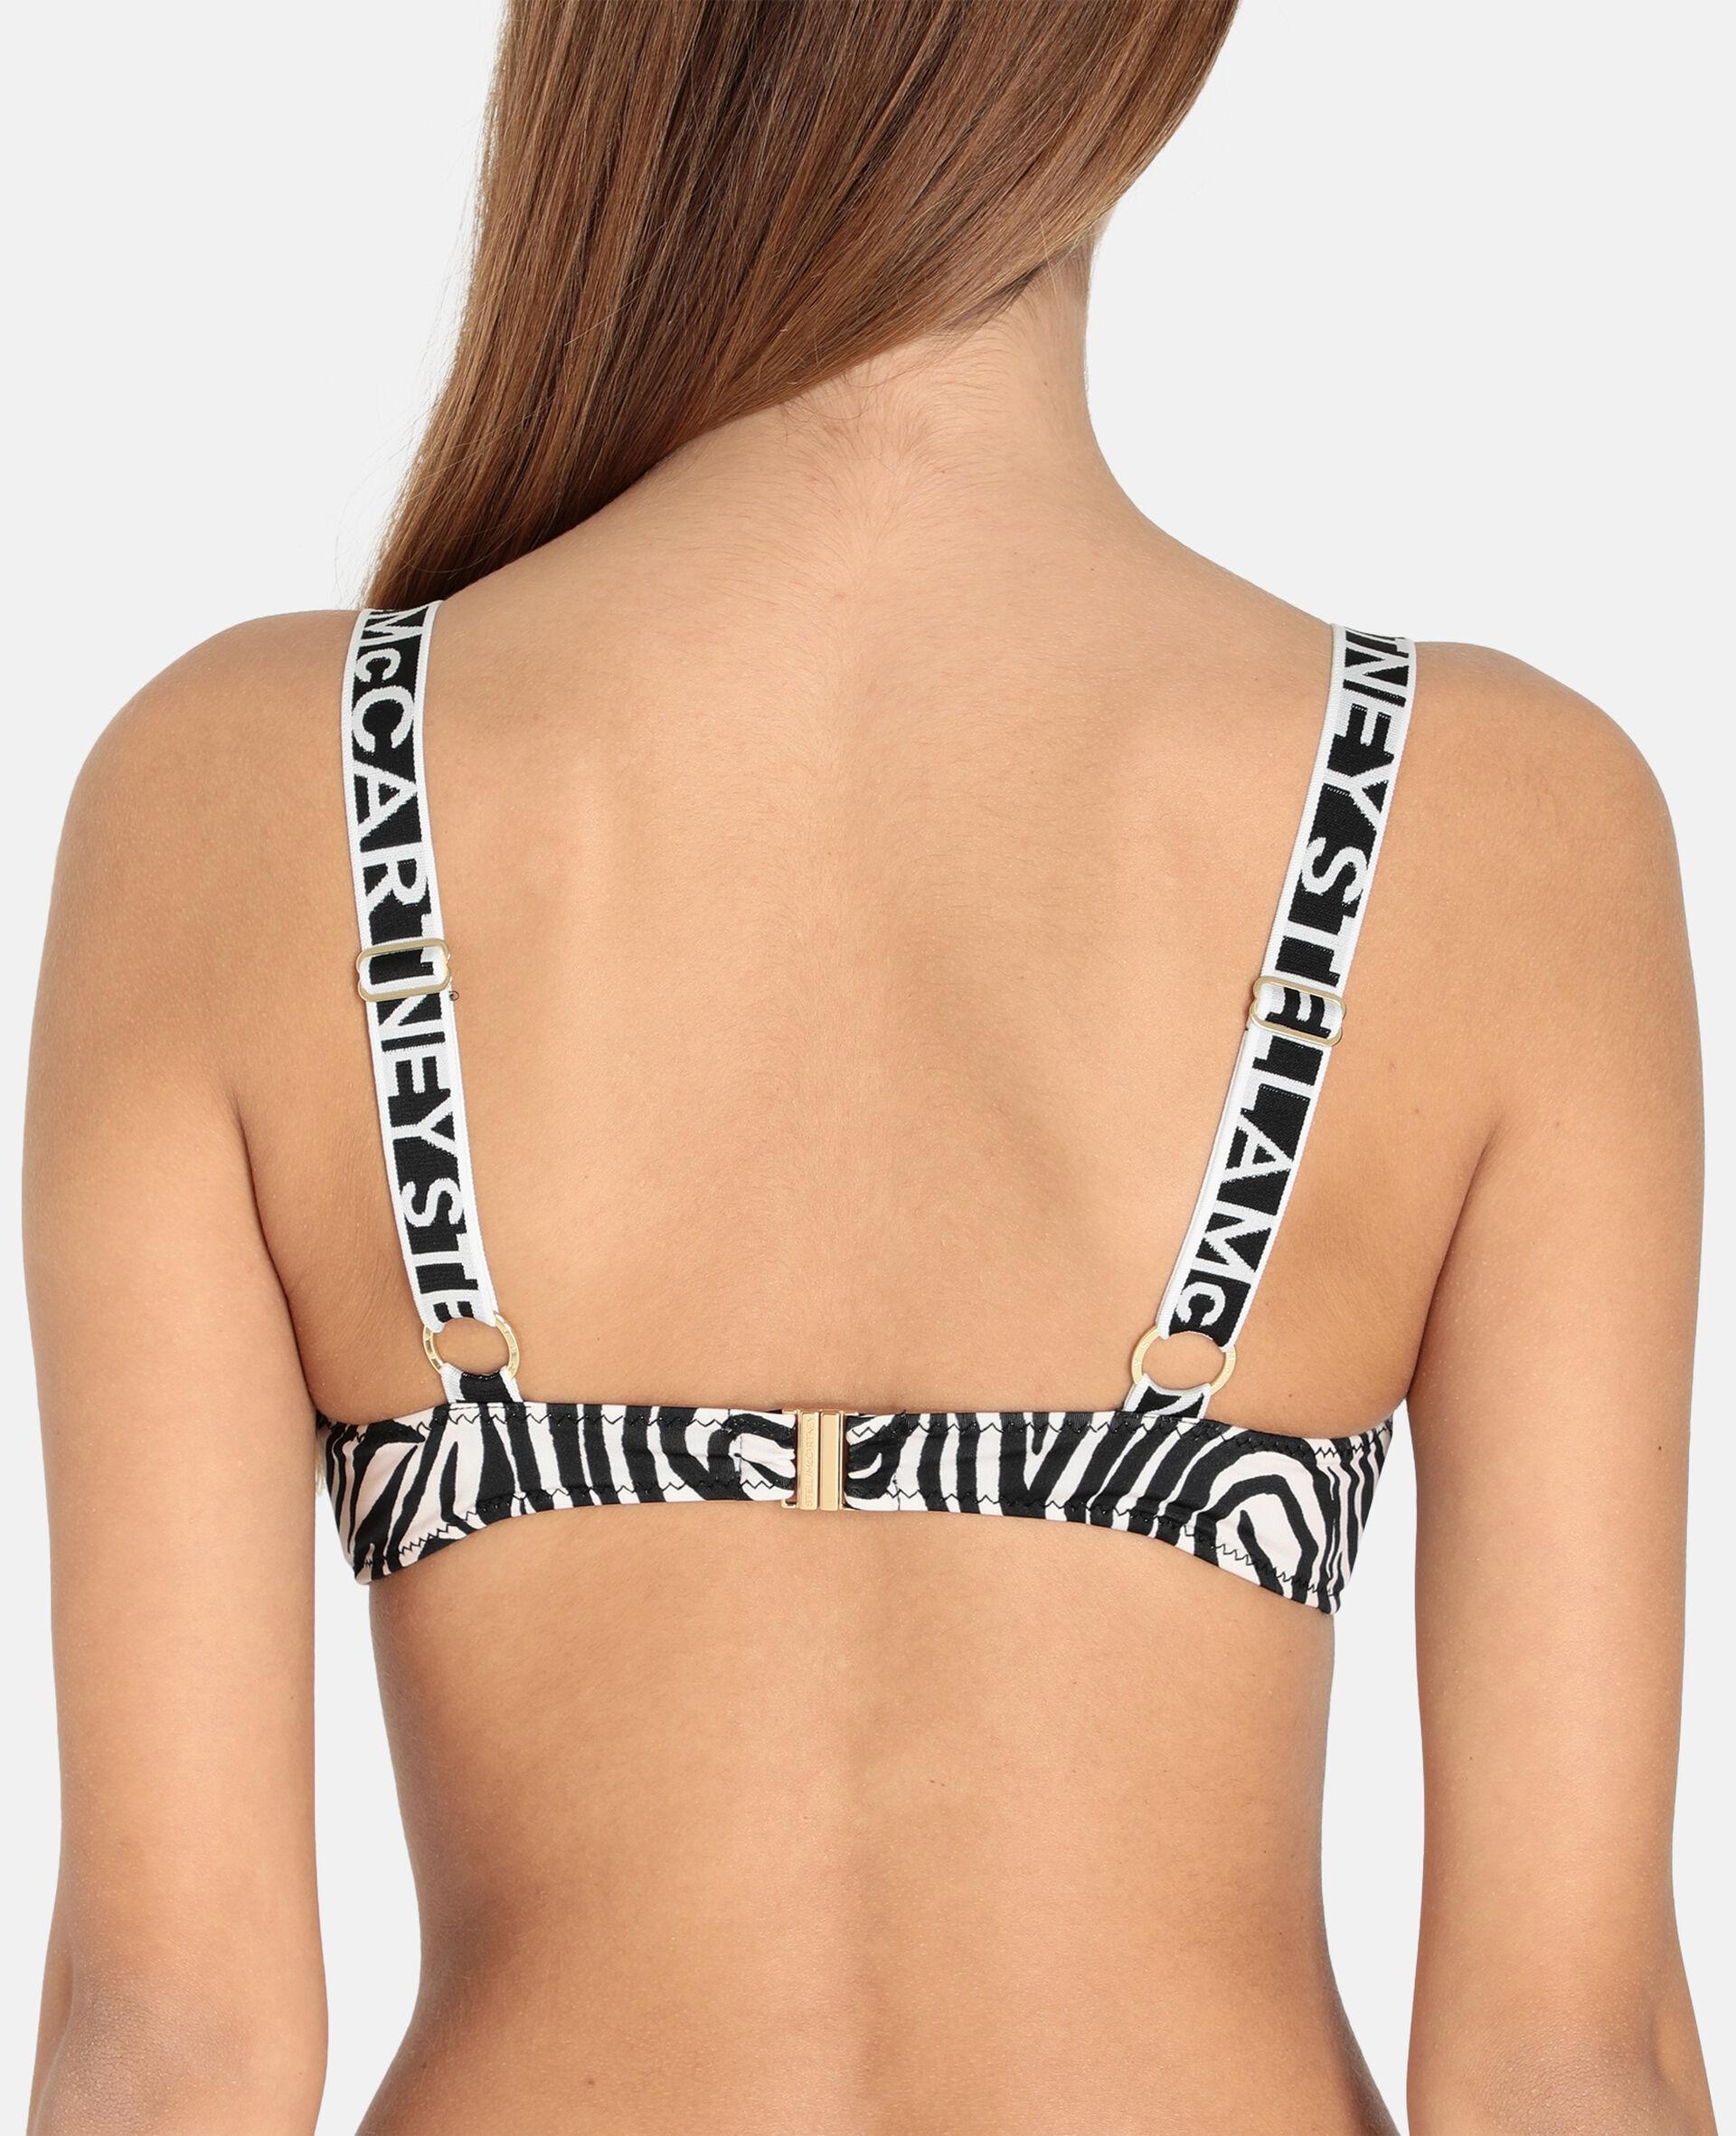 Animal Mix Padded Brassiere Bikini Top-Black-large image number 2